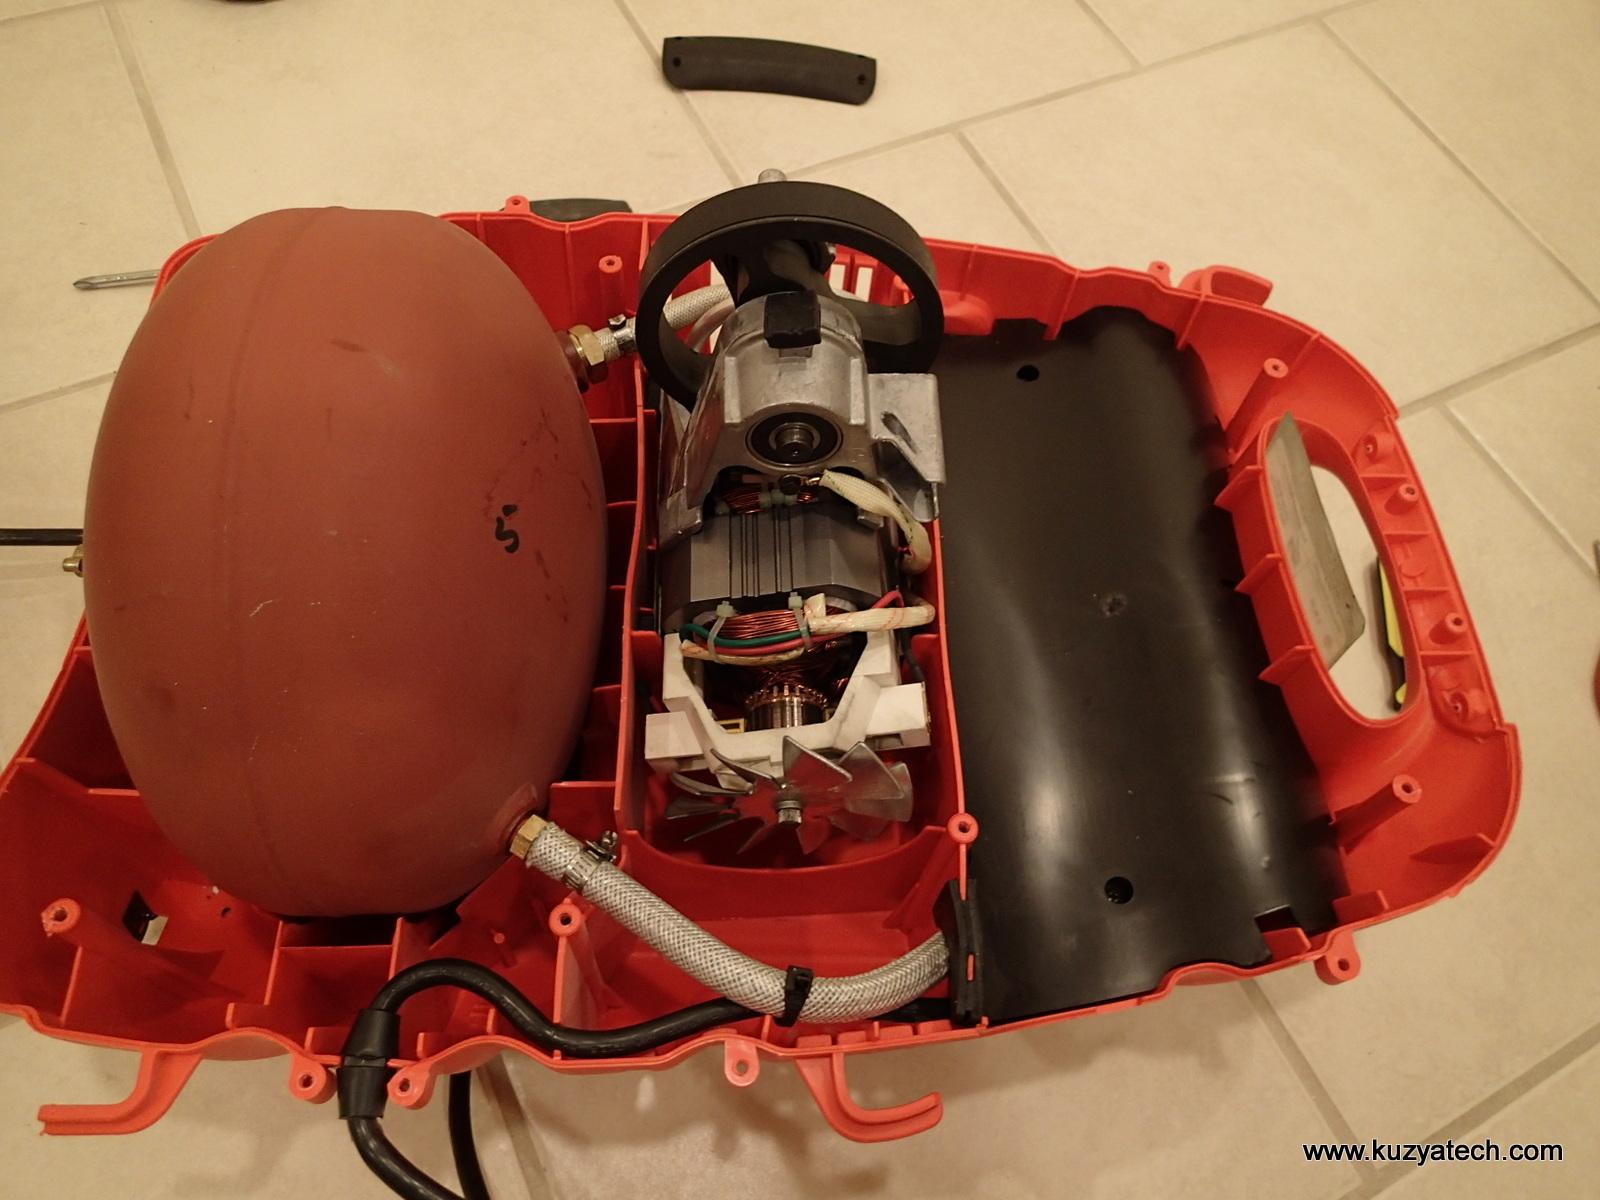 Husky Air Compressor Pressure Switch Wiring Diagram Replacing Pressure Regulator On Husky Air Scout Compressor